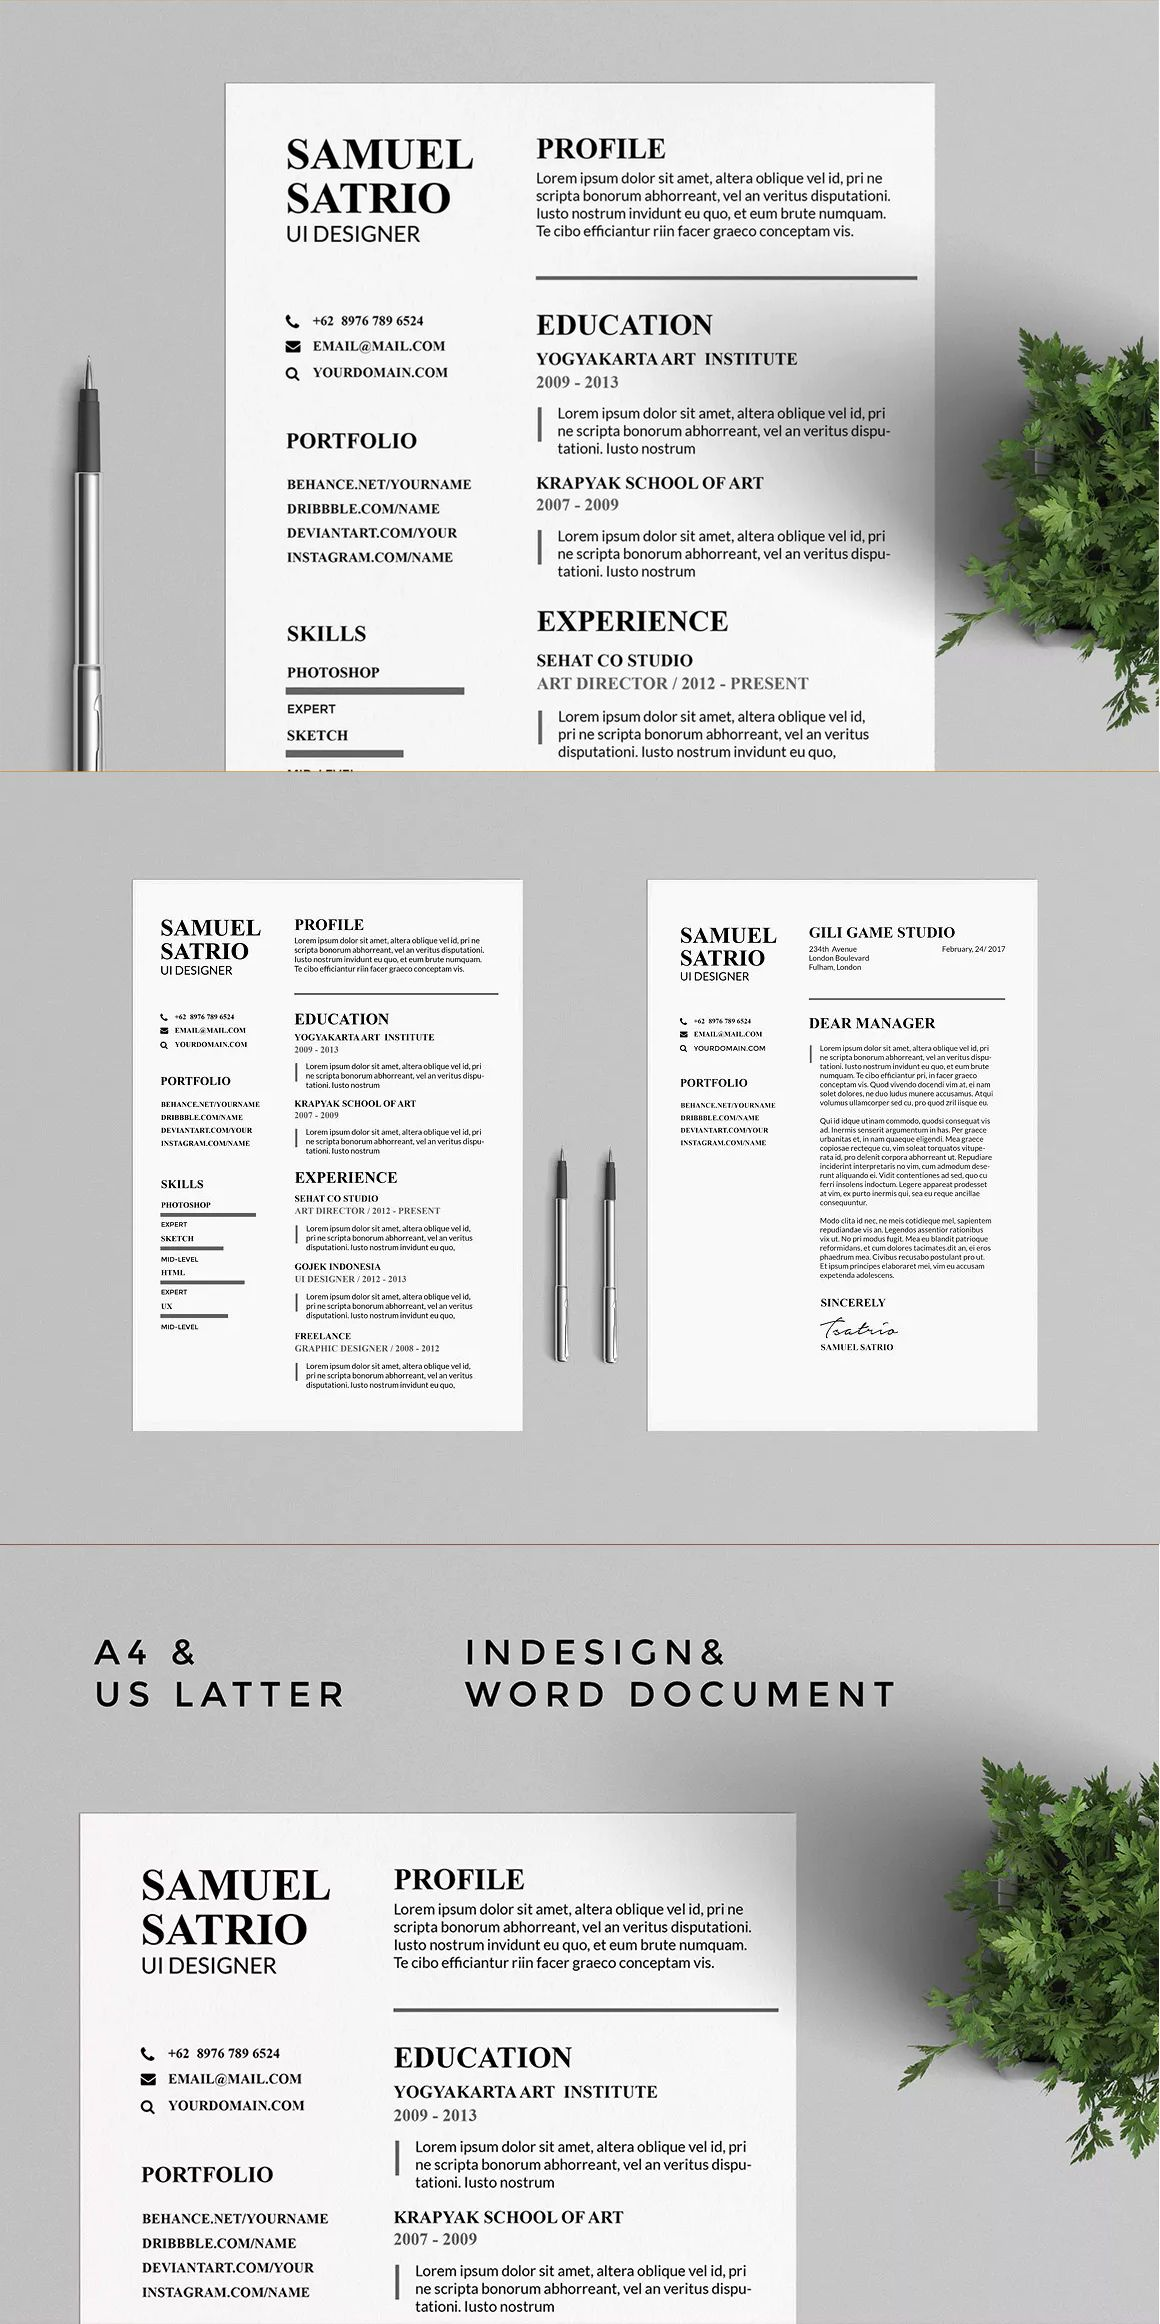 Pros Resume & CV Templates InDesign INDD - A4 & US Letter Size ...